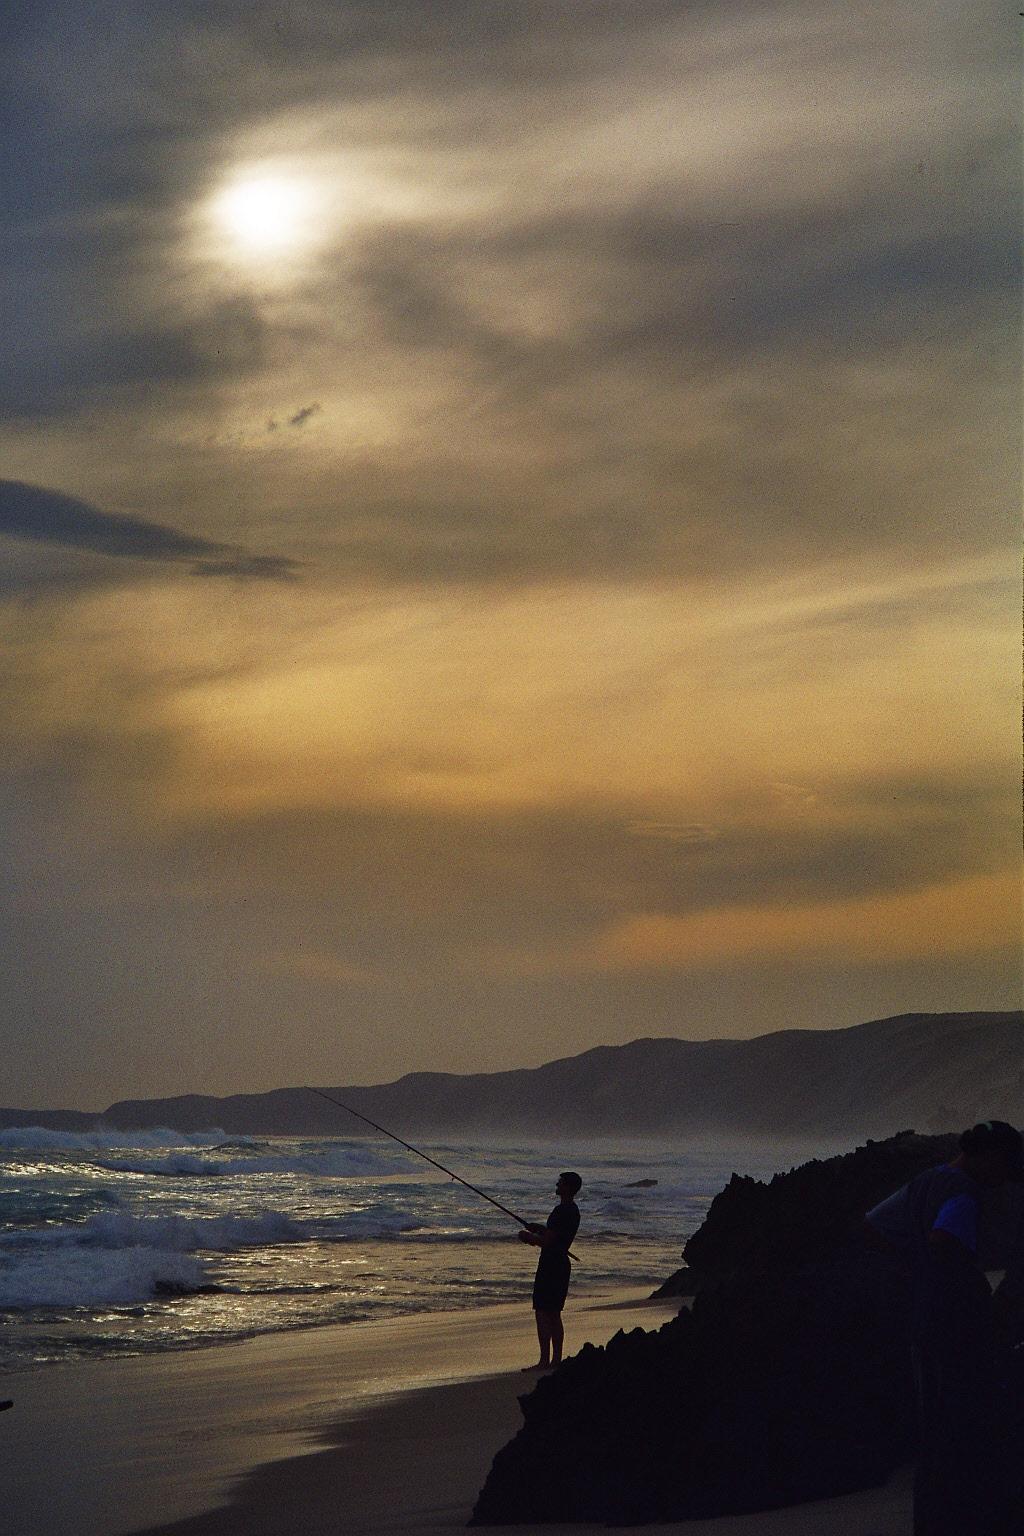 Sunset fishing for Australien salmon on pristine beaches, Albany, Western Australia, Australia